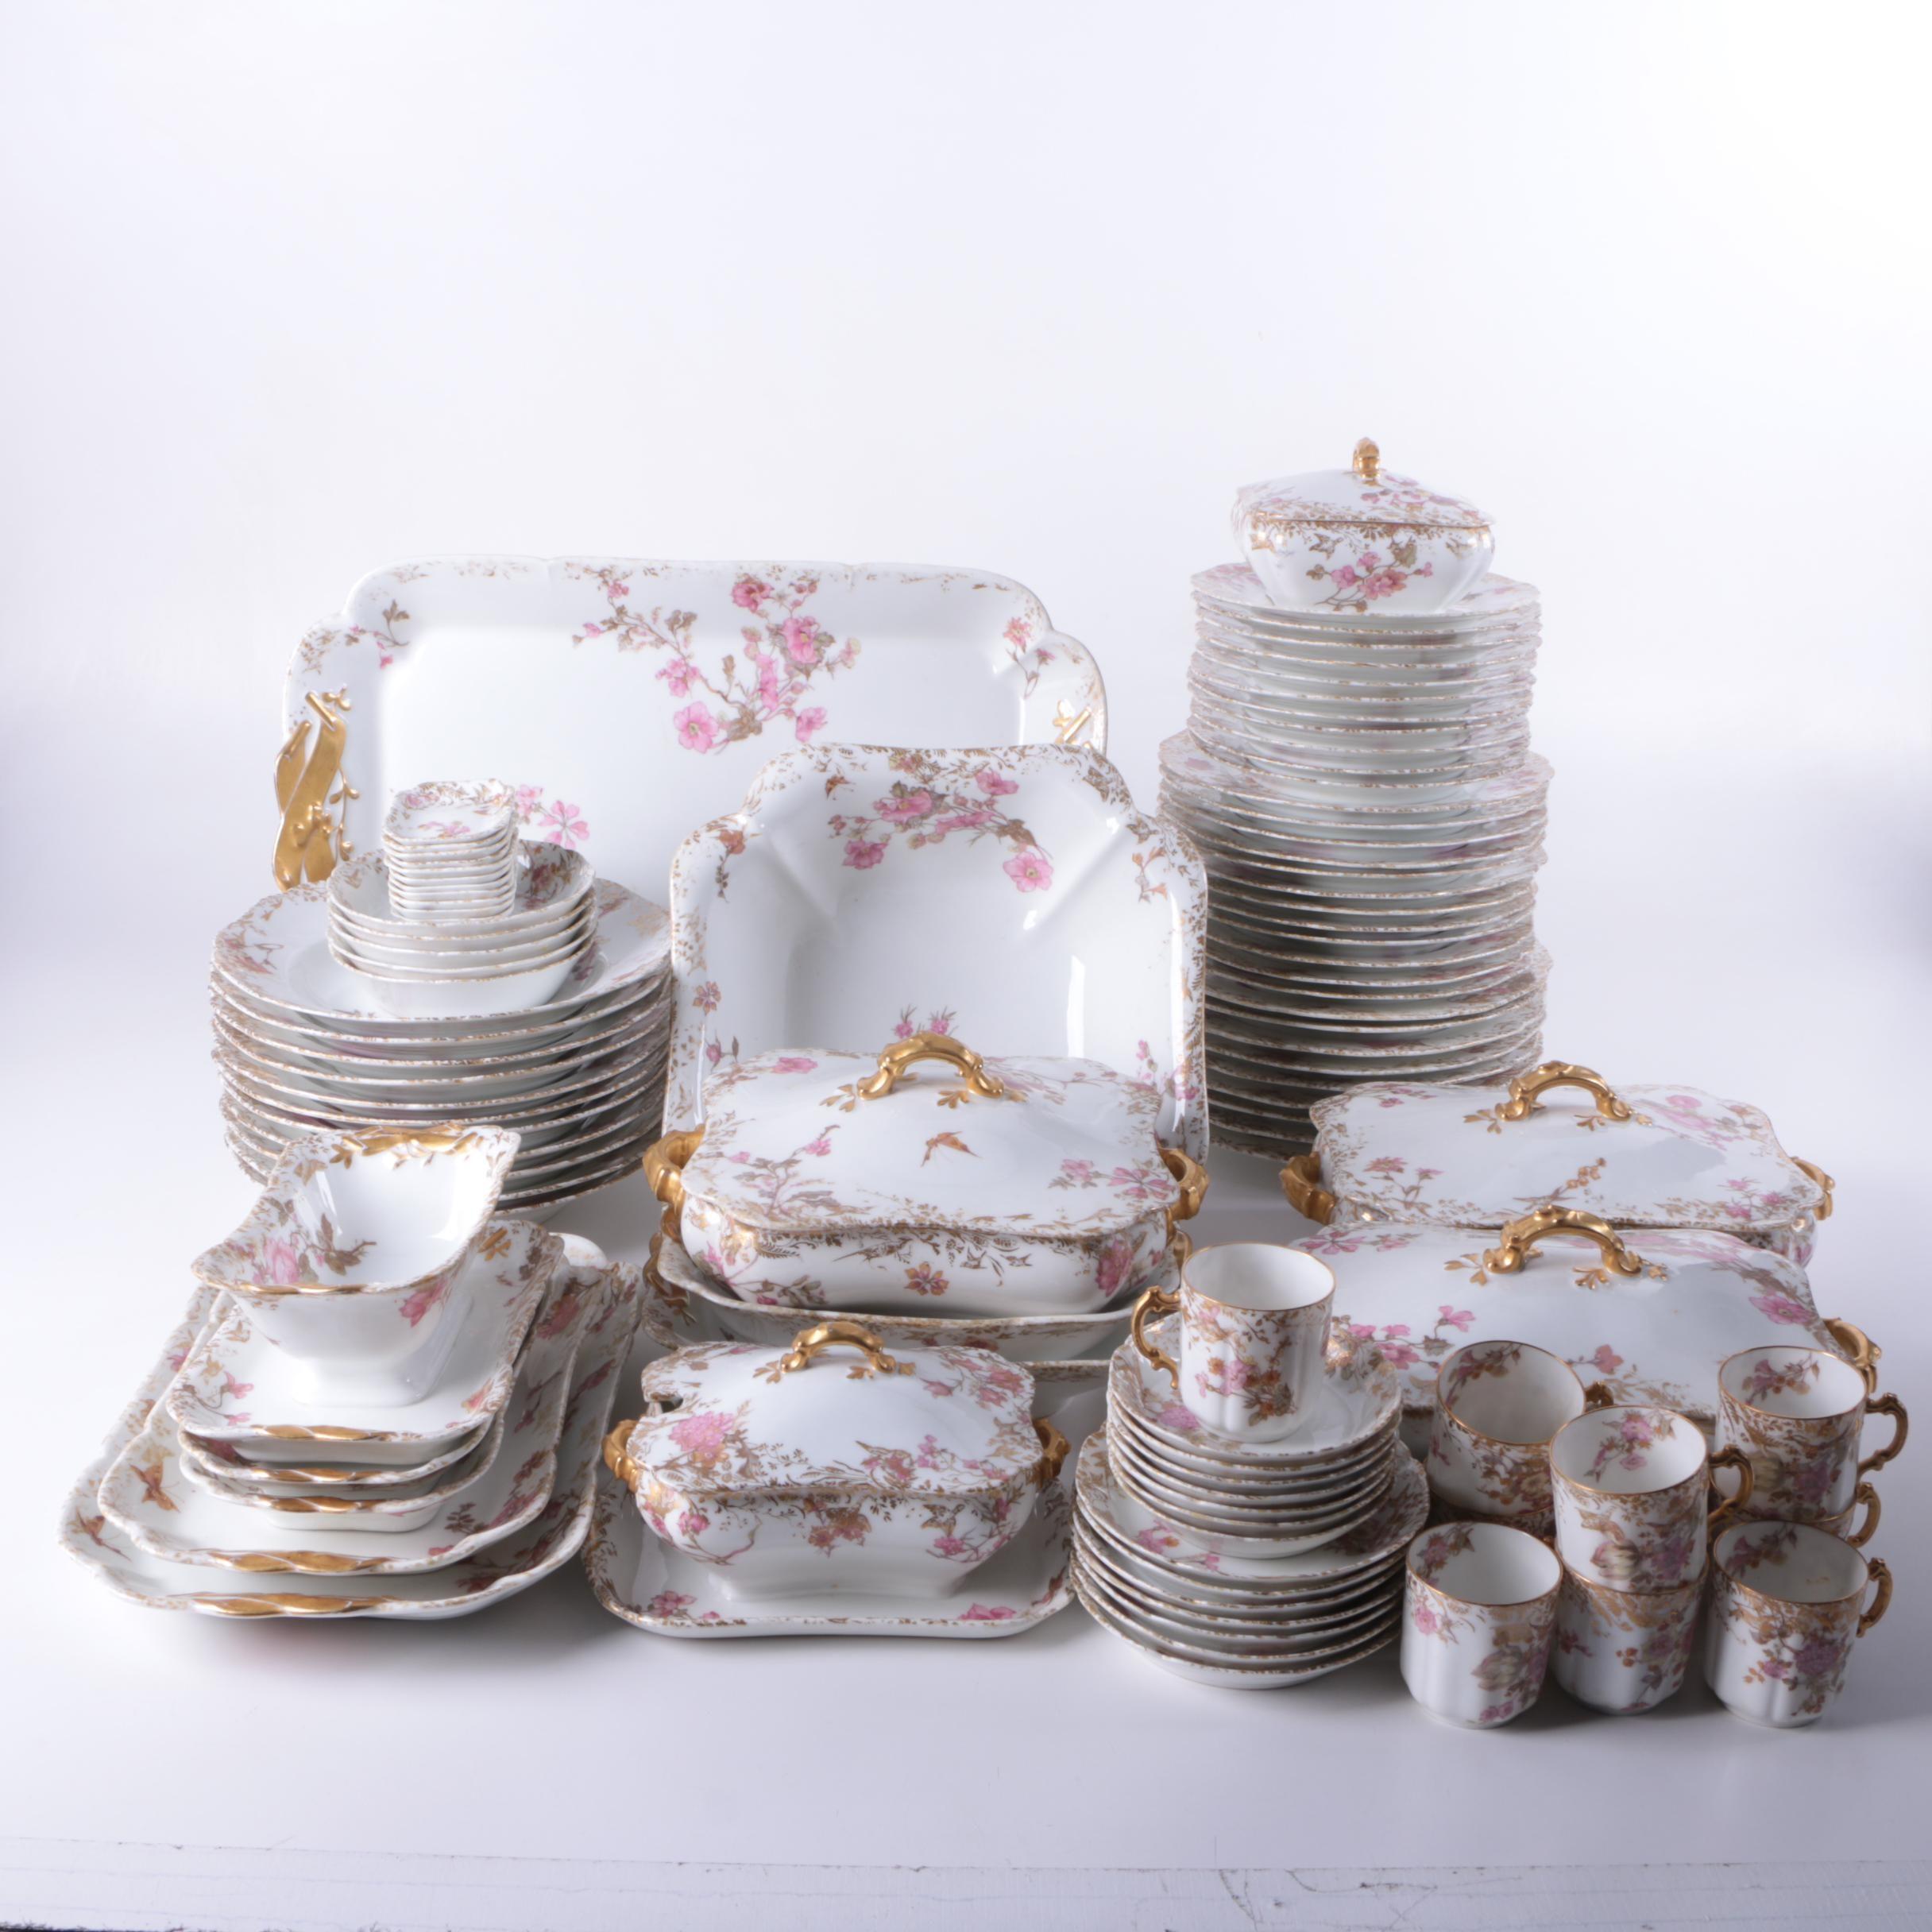 Antique Haviland Limoges Porcelain Dinnerware